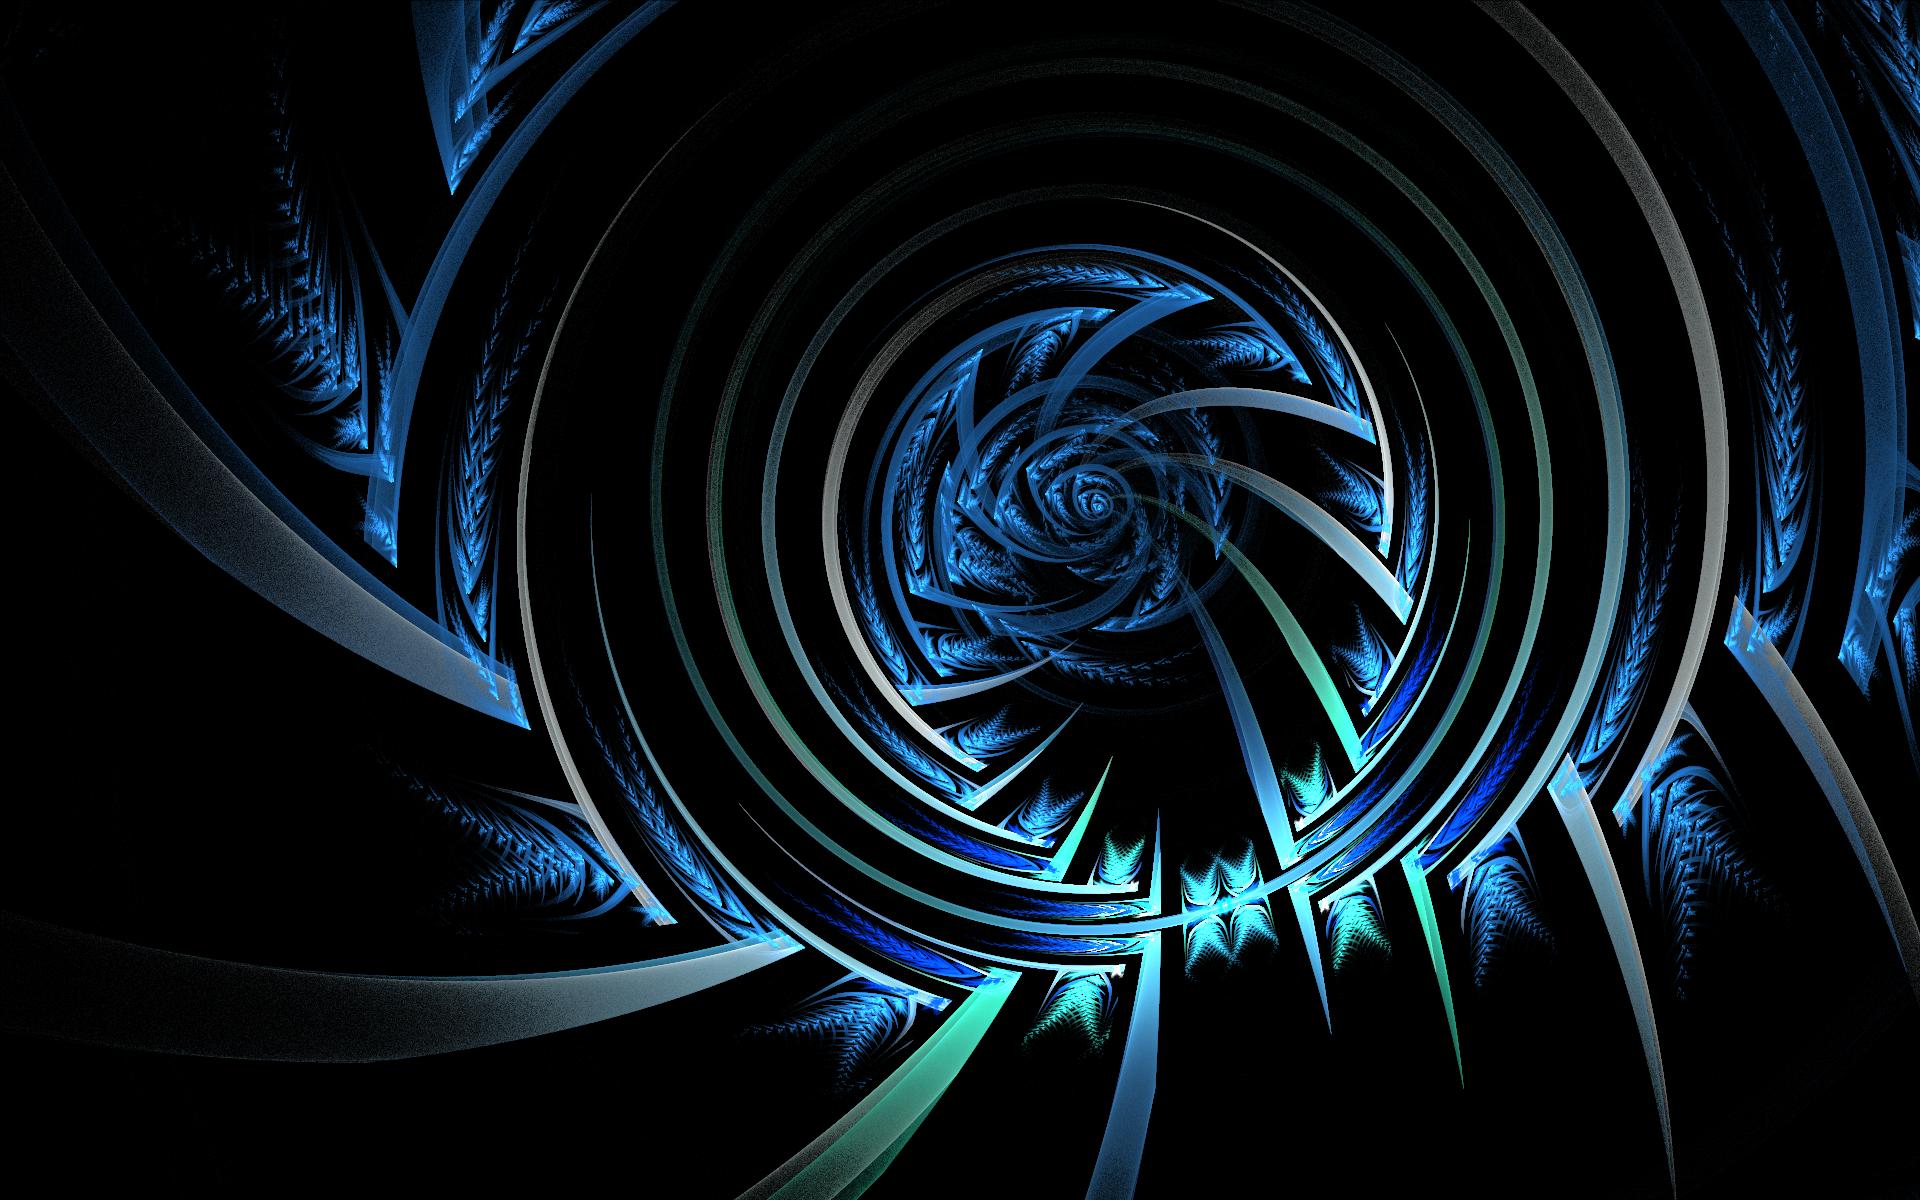 Z3600 by Fractamonium